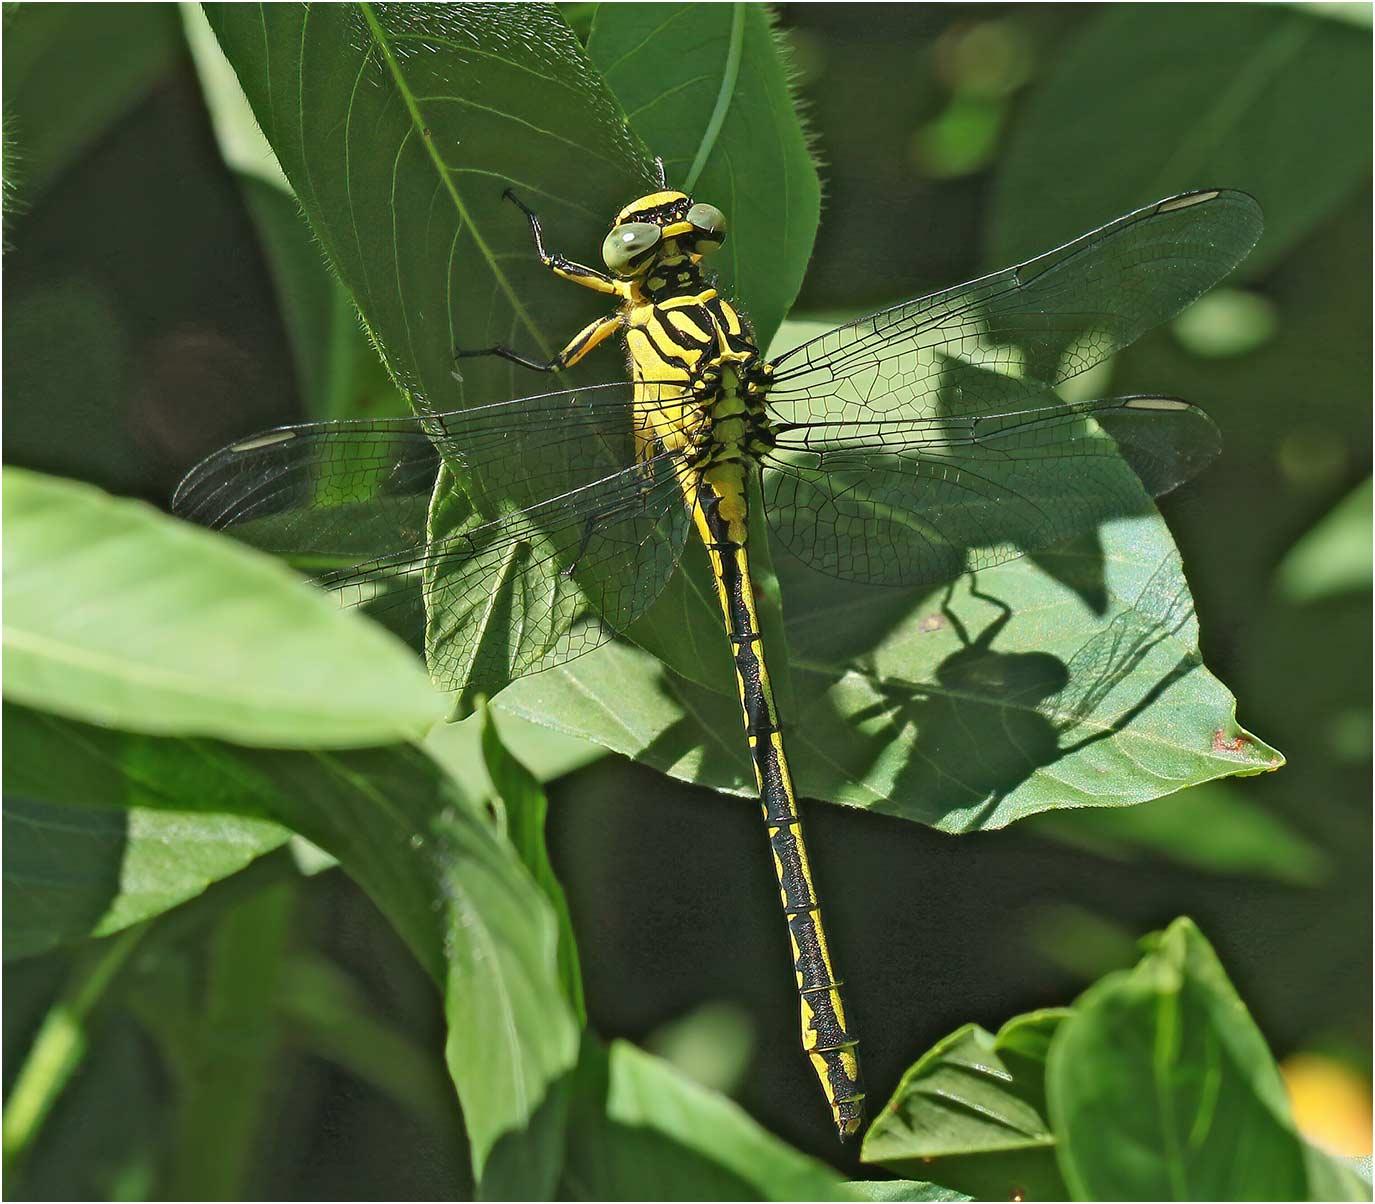 Stylurus flavipes femelle, Siest (France-40), 05/07/2020